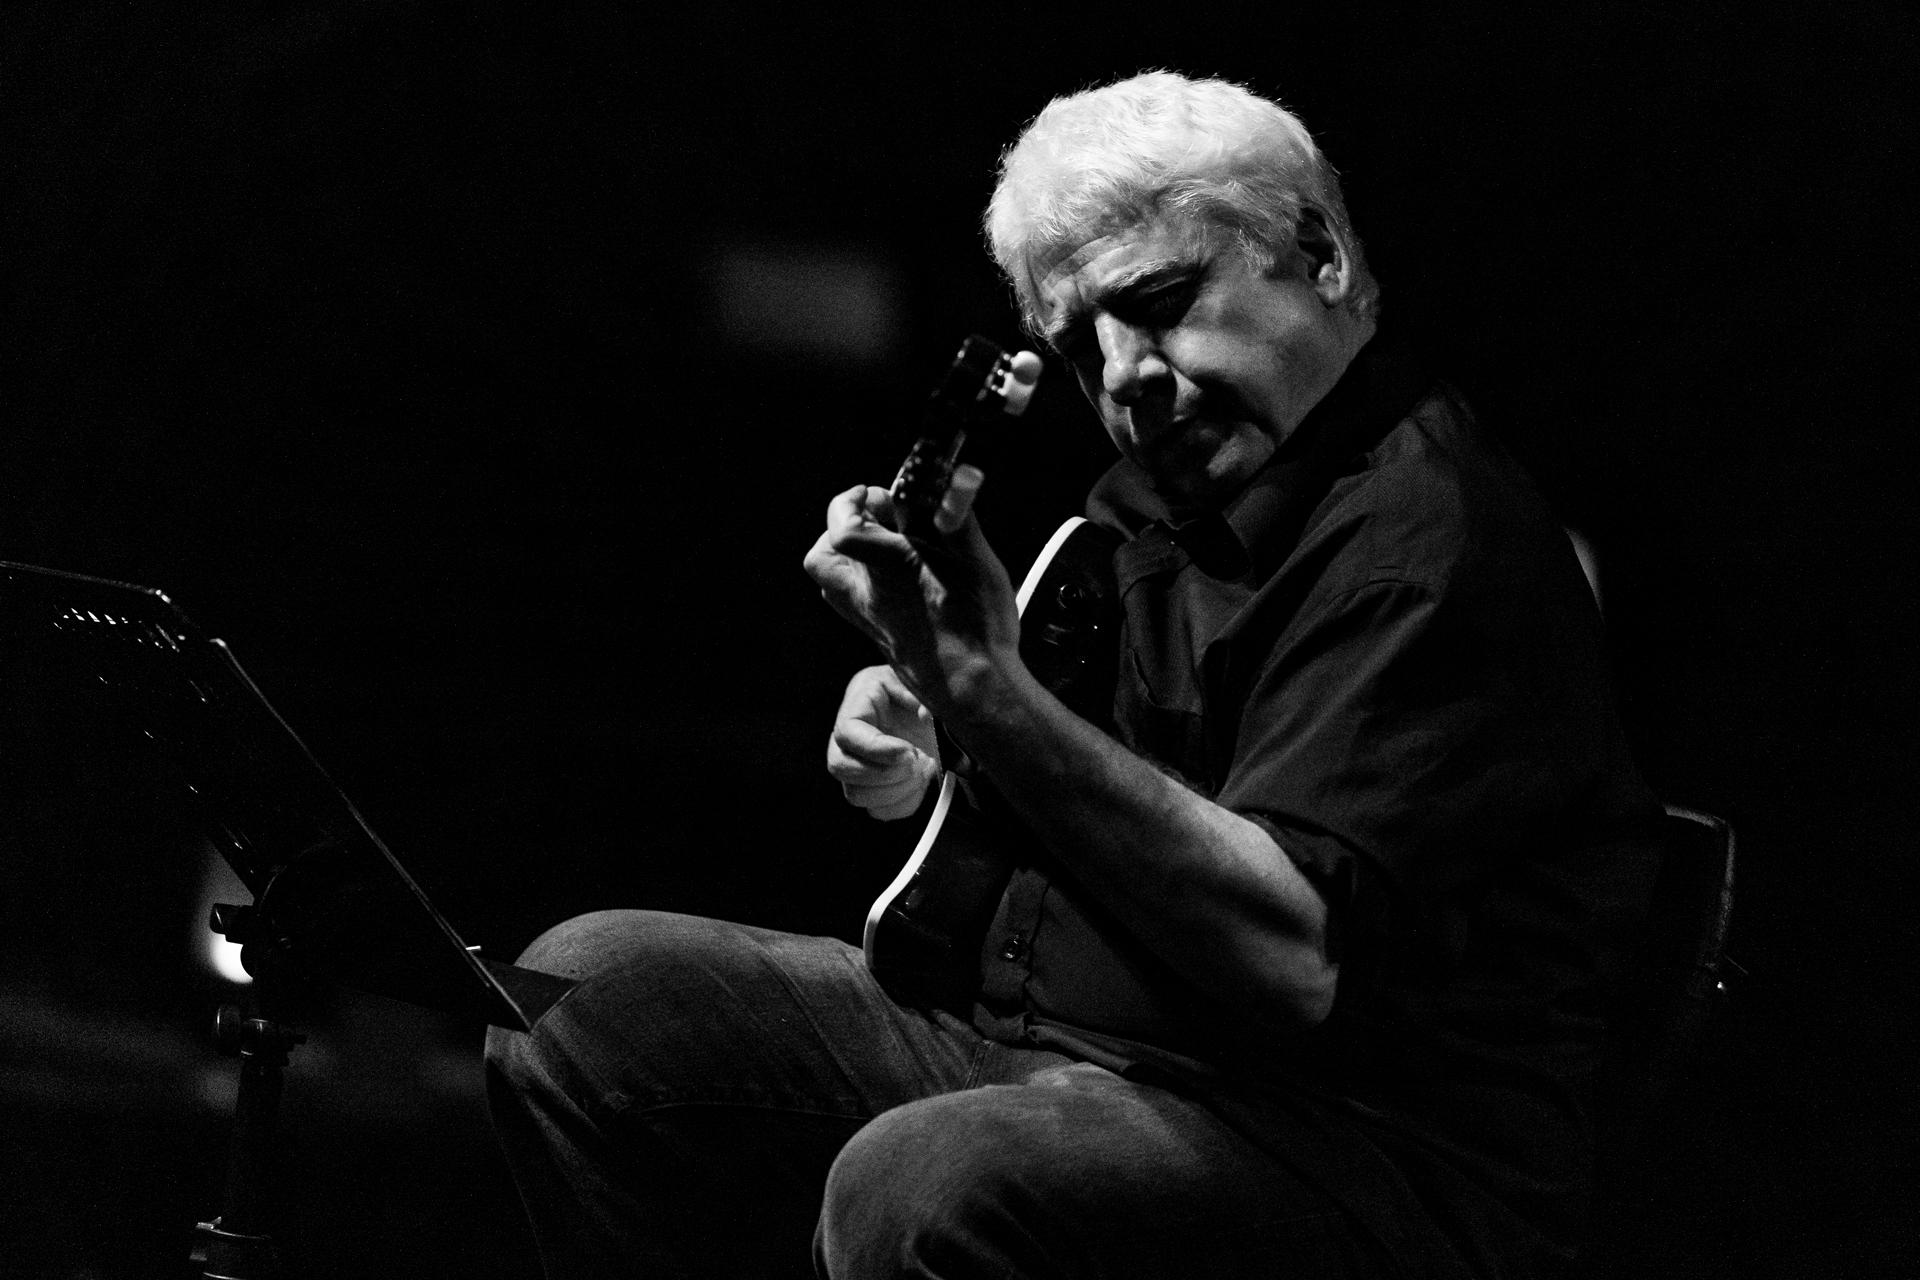 2019_09_05-Jaques-Morelenbaum-Cello-Samba-Trio-©-Luca-Vantusso-213411-5D4B5165